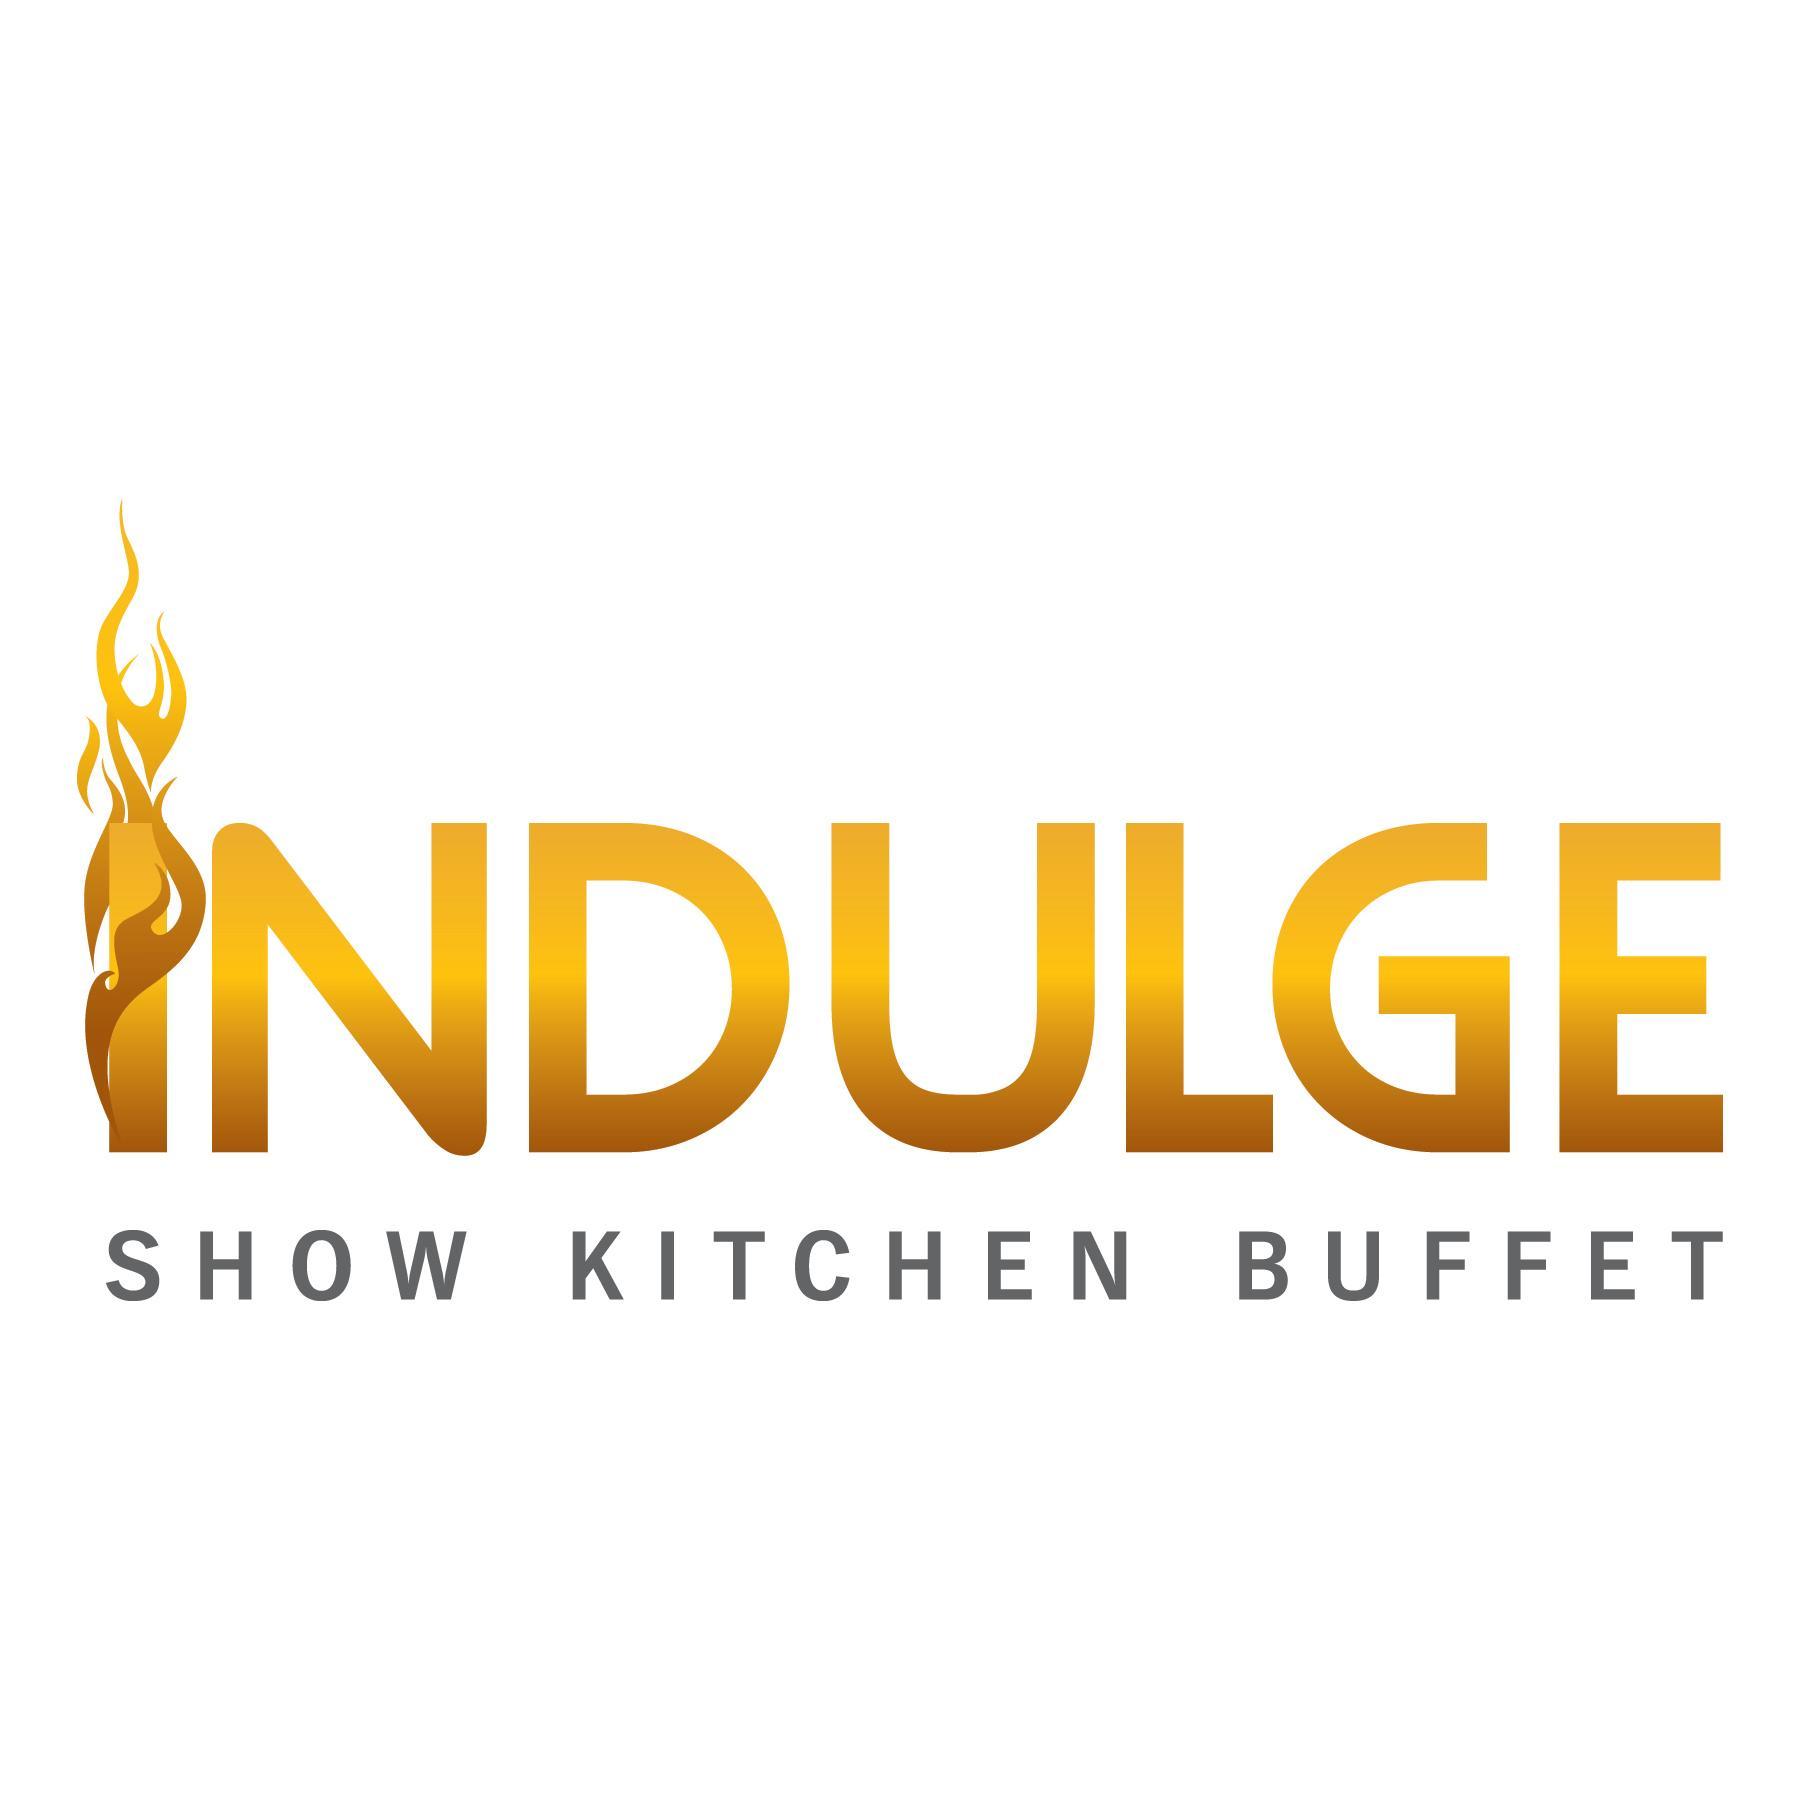 Indulge Show Kitchen Buffet